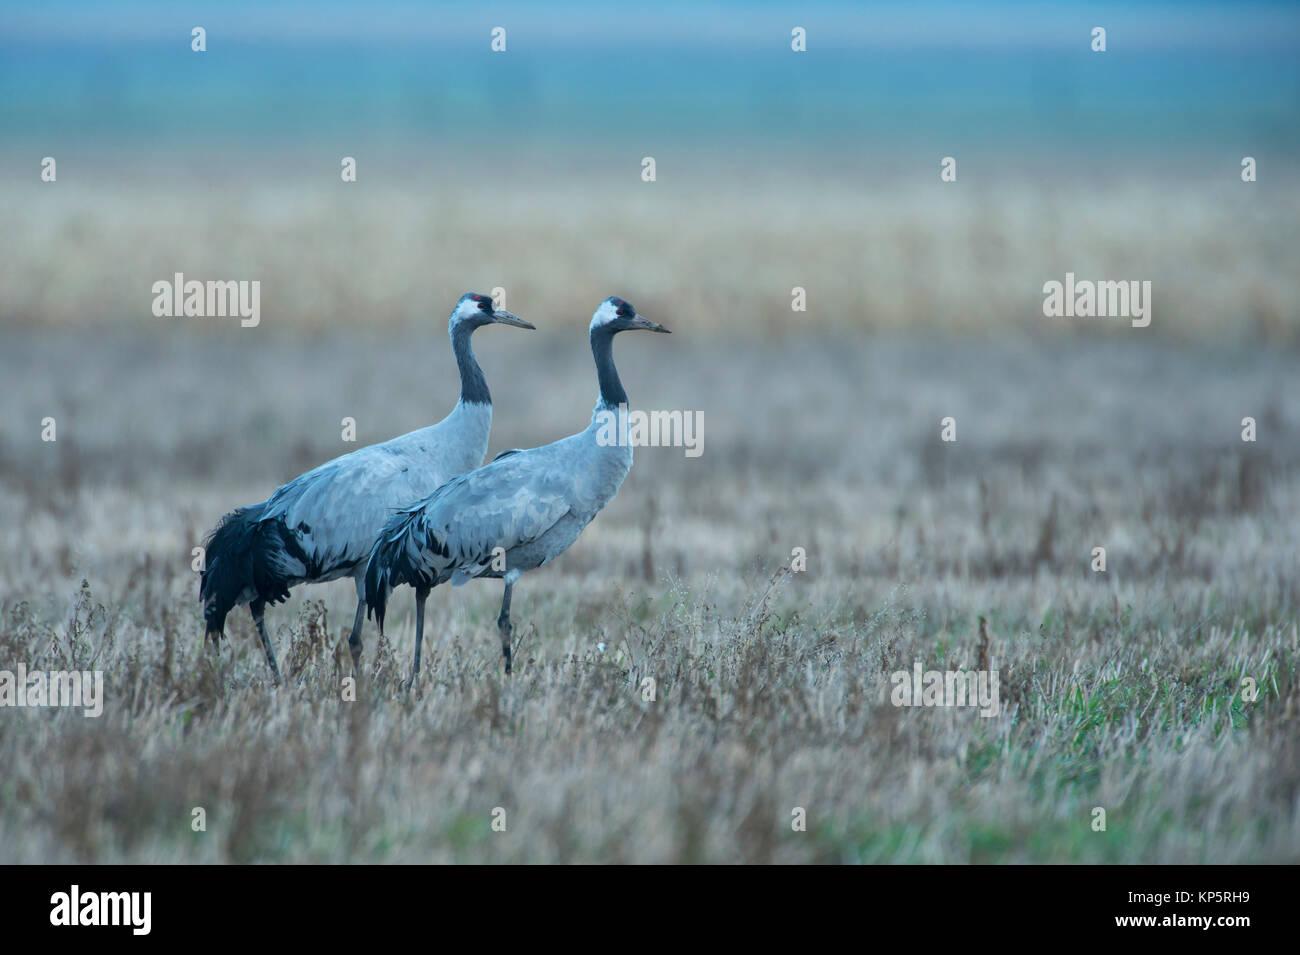 Kranich, Grus grus, couple of cranes - Stock Image